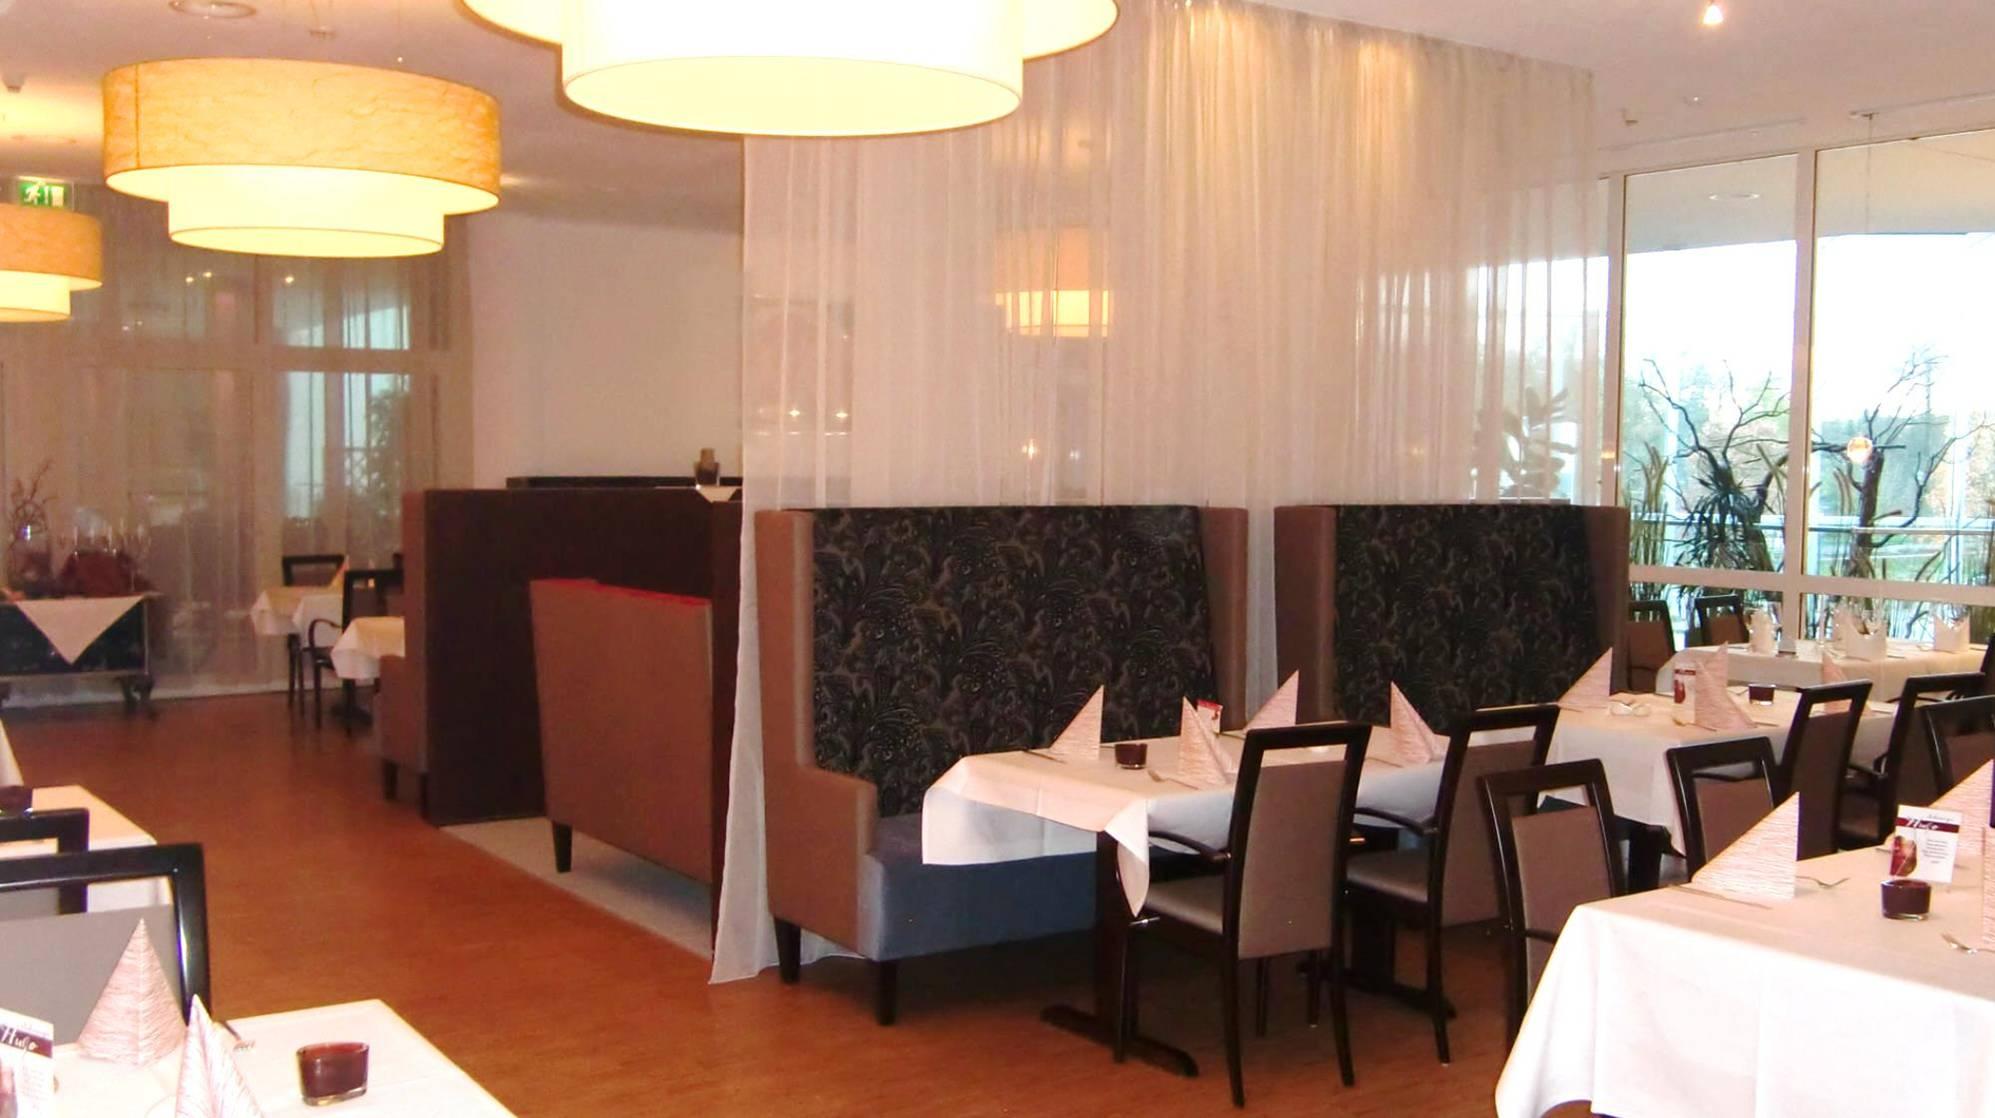 Restaurant LebensArt & Mühlenstube | Bad Düben